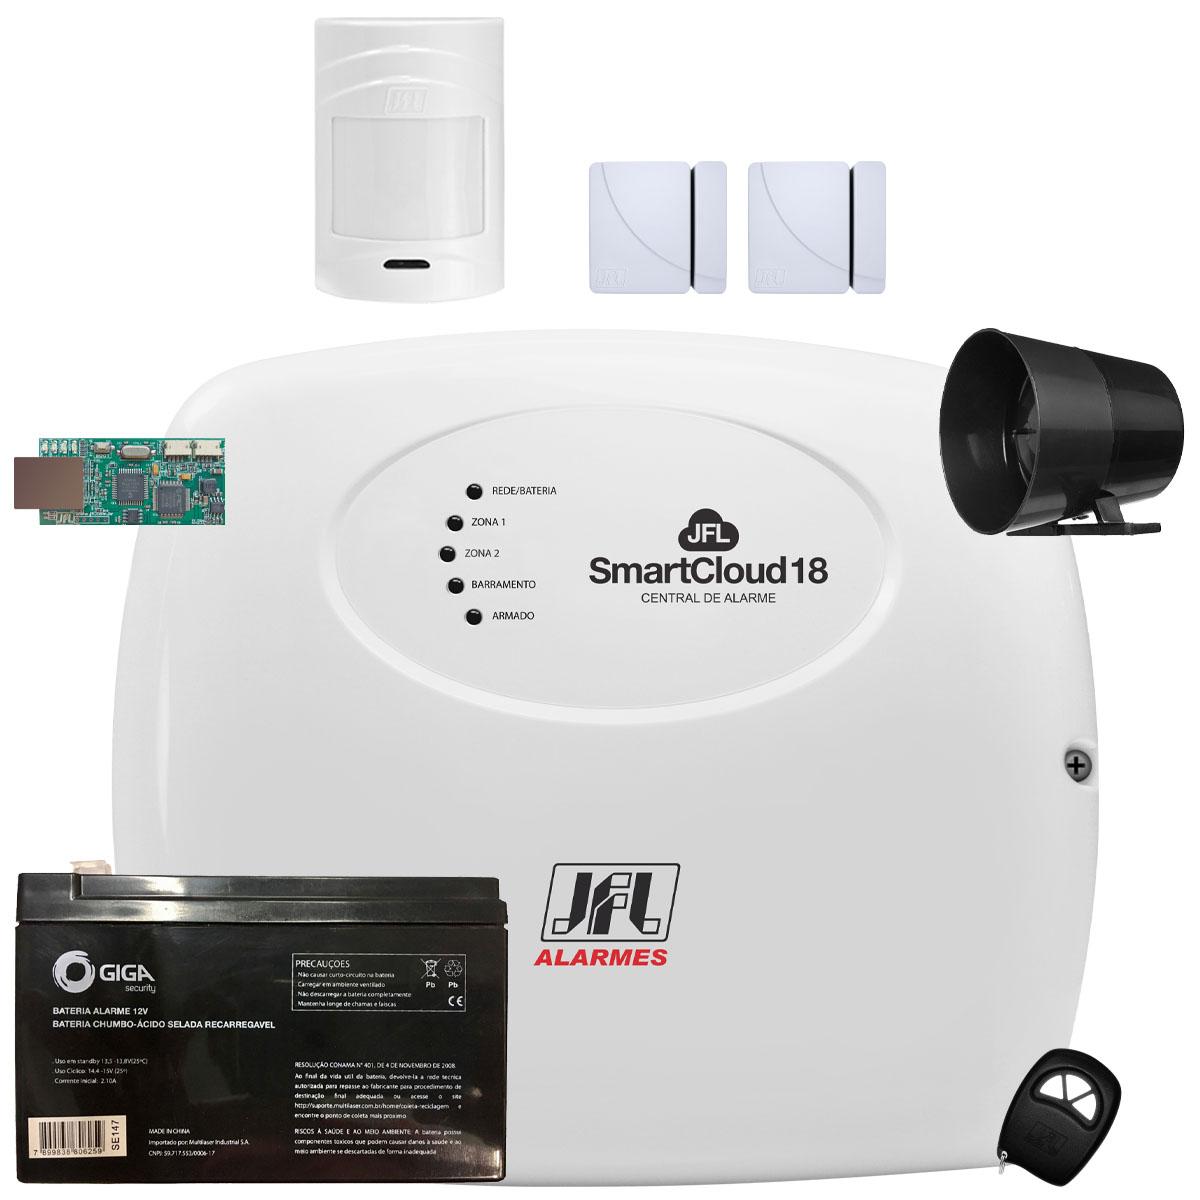 Kit Alarme SmartCloud 18 Jfl Com Sensores Sem Fio